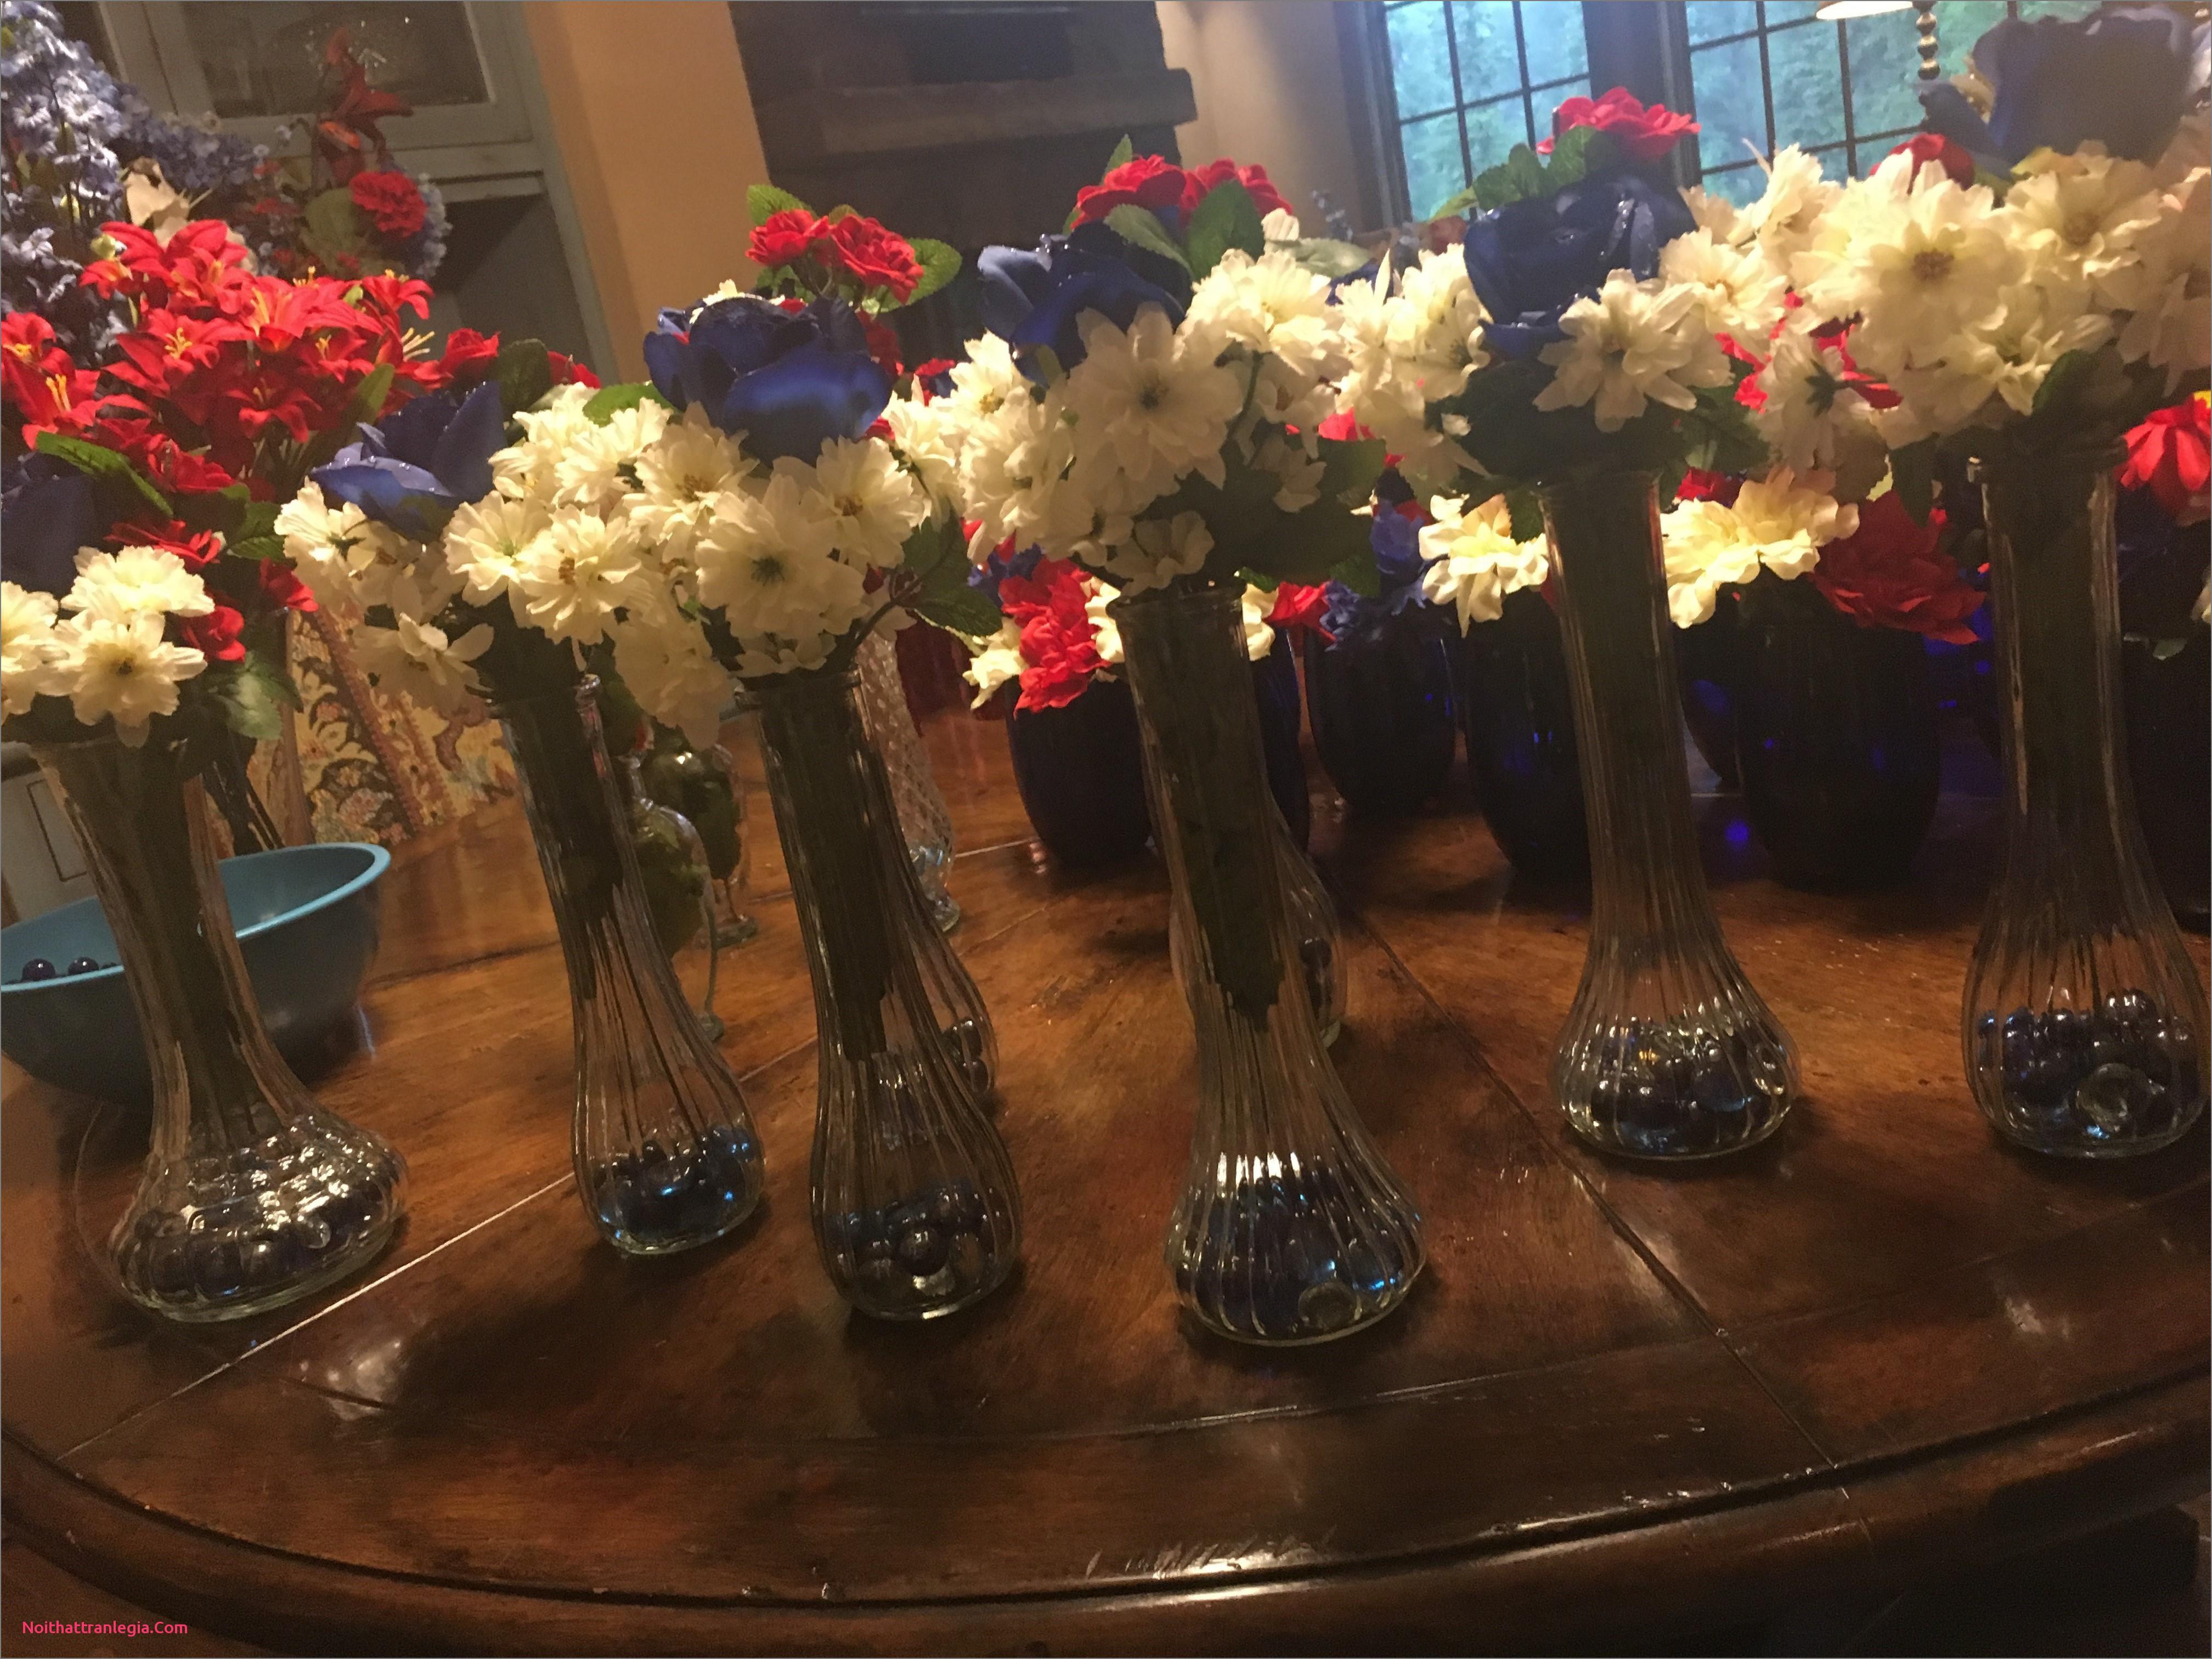 24 vases in bulk of 20 wedding vases noithattranlegia vases design regarding decoration line luxury dollar tree wedding decorations awesome h vases dollar vase i 0d